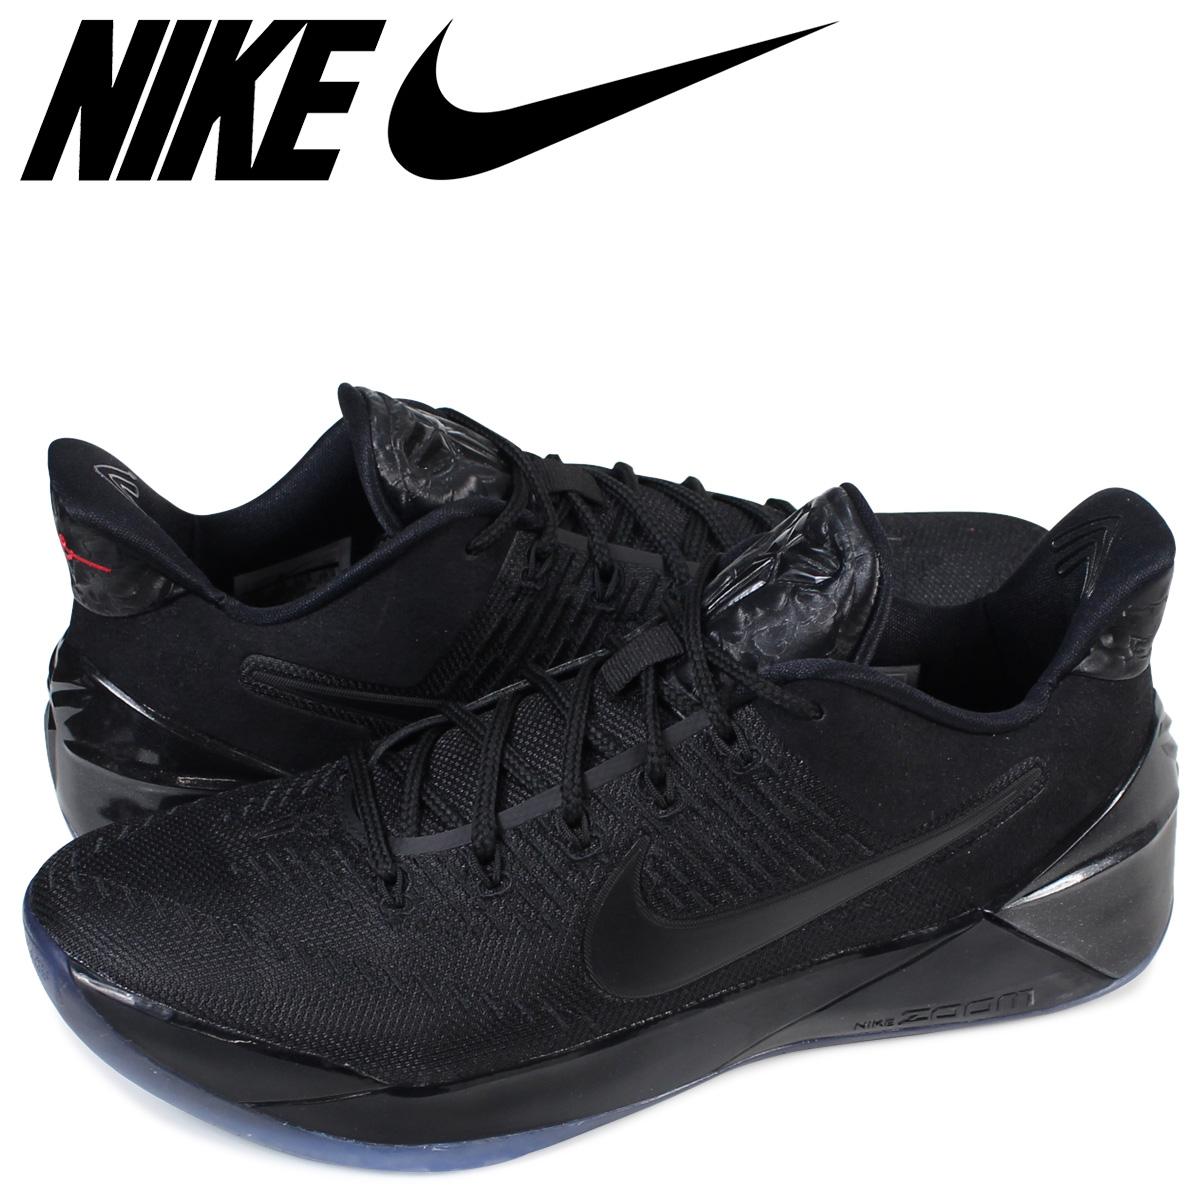 new product 1d68d 74876 NIKE Nike Corby sneakers KOBE AD 852,425-064 men's shoes black black